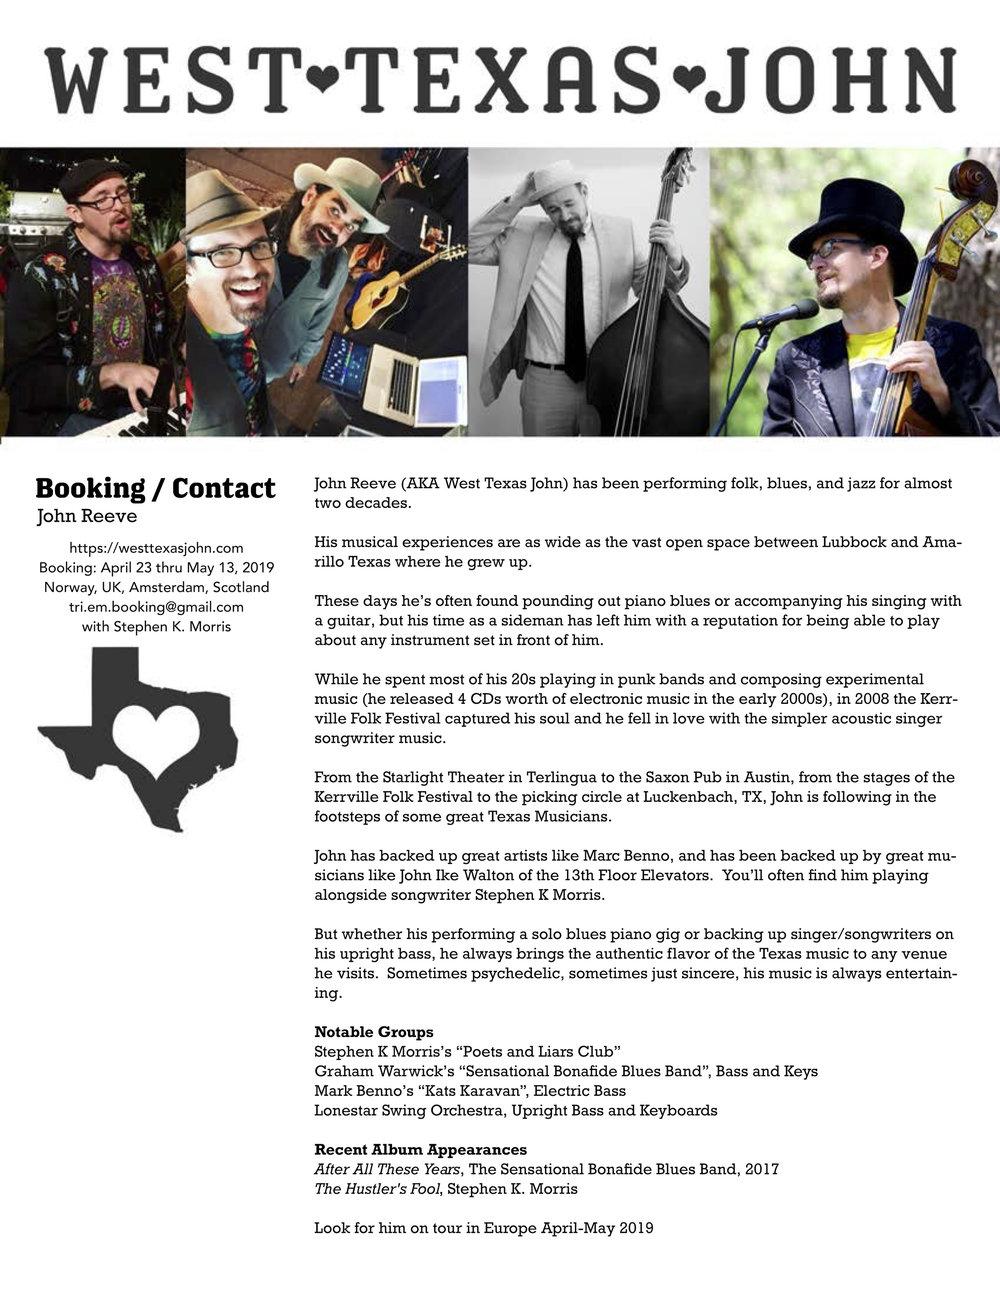 West Texas John Onesheet